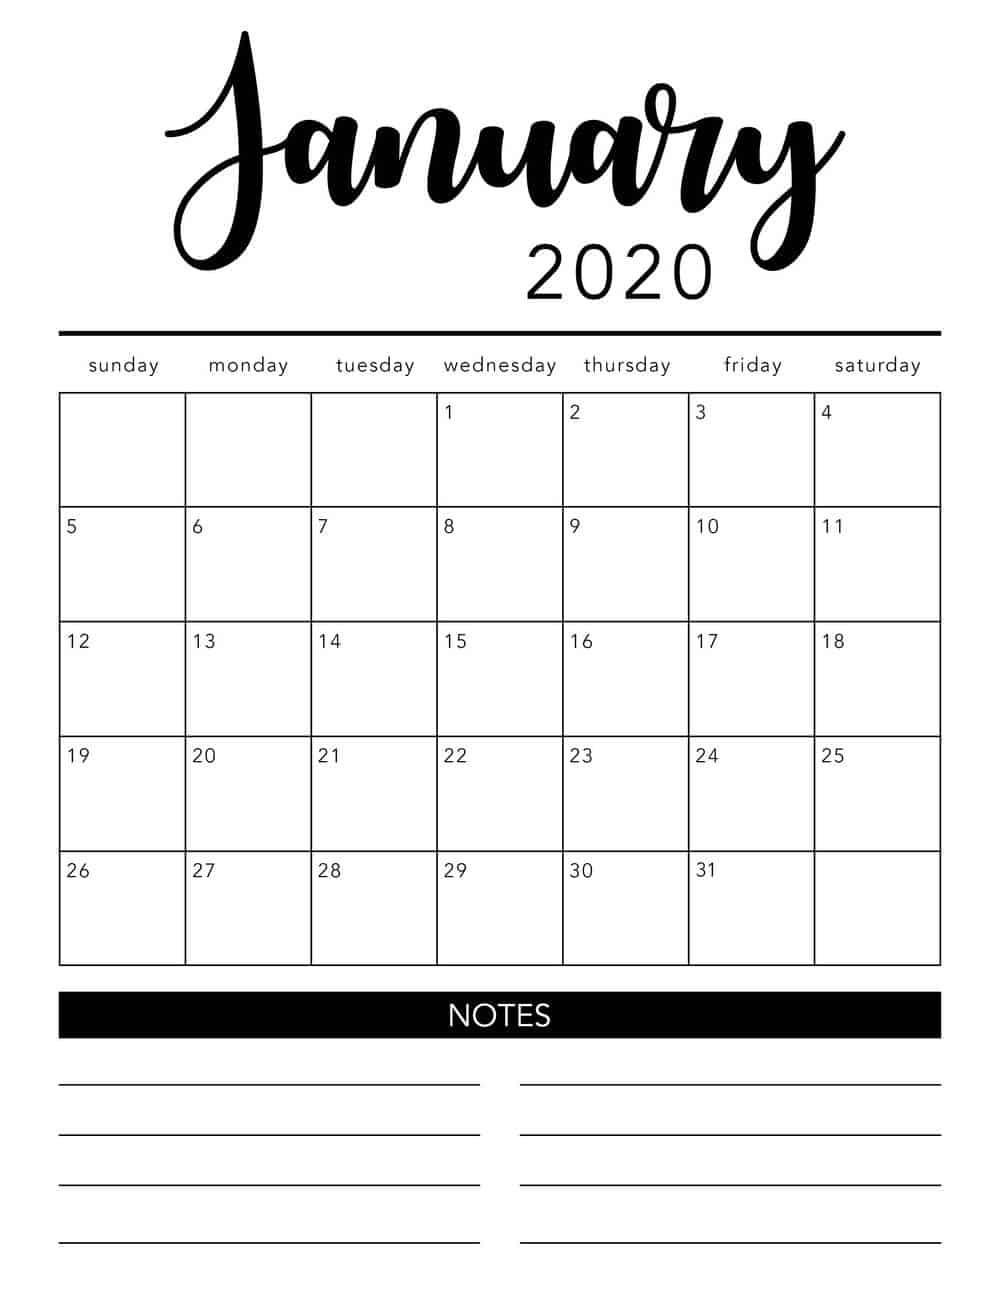 Free 2020 Printable Calendar Template (2 Colors!) - I Heart-Printable Monthly Calendar 2020